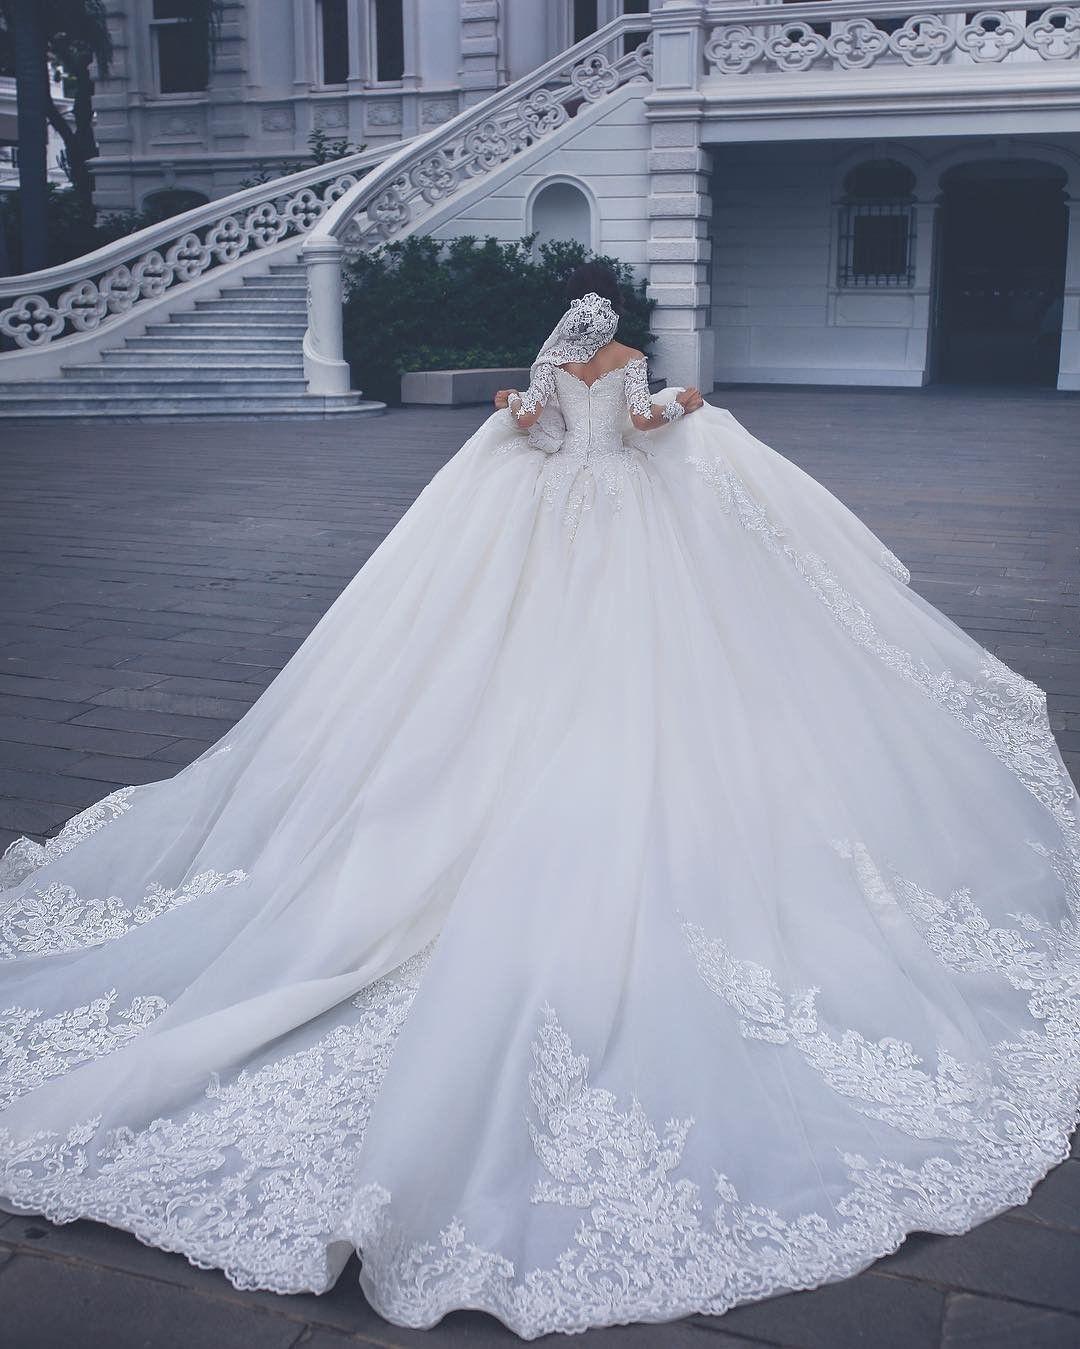 Long Sleeve Tulle Vestido De Novia Off Shoulder Long Sleeves Lace Appliques Ball Gown Wedding Dress Elegance Plus Size Wedding Gown Cheap